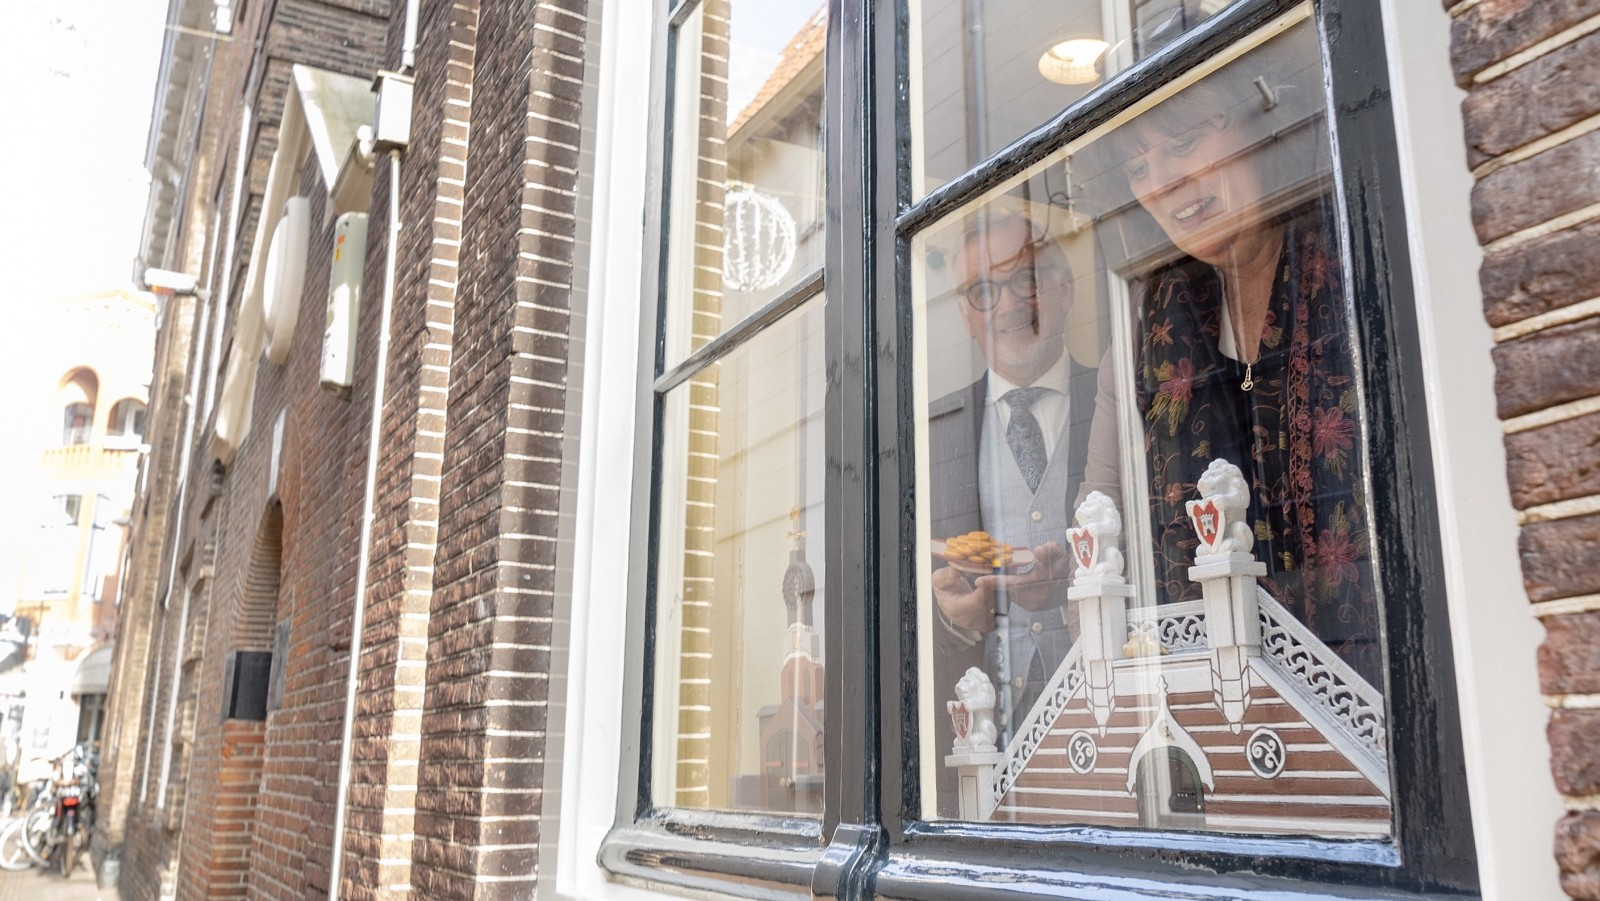 gemeente Alkmaar / Jan Jong